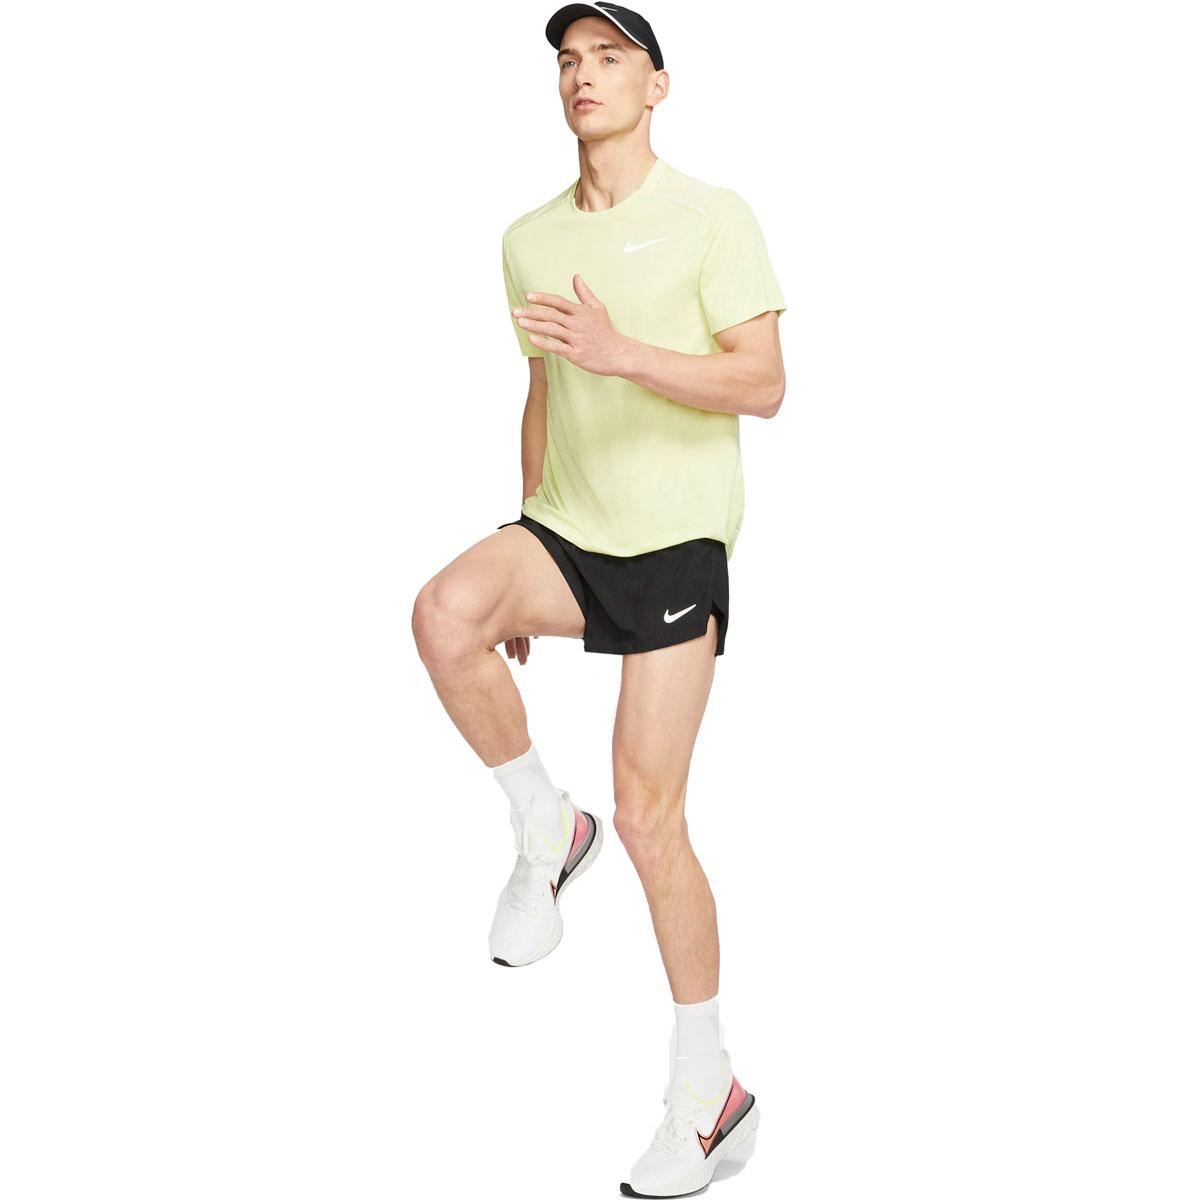 "Men's Nike Fast 2"" Running Shorts - Color: Black/Reflective Silver - Size: S, Black/Reflective Silver, large, image 4"